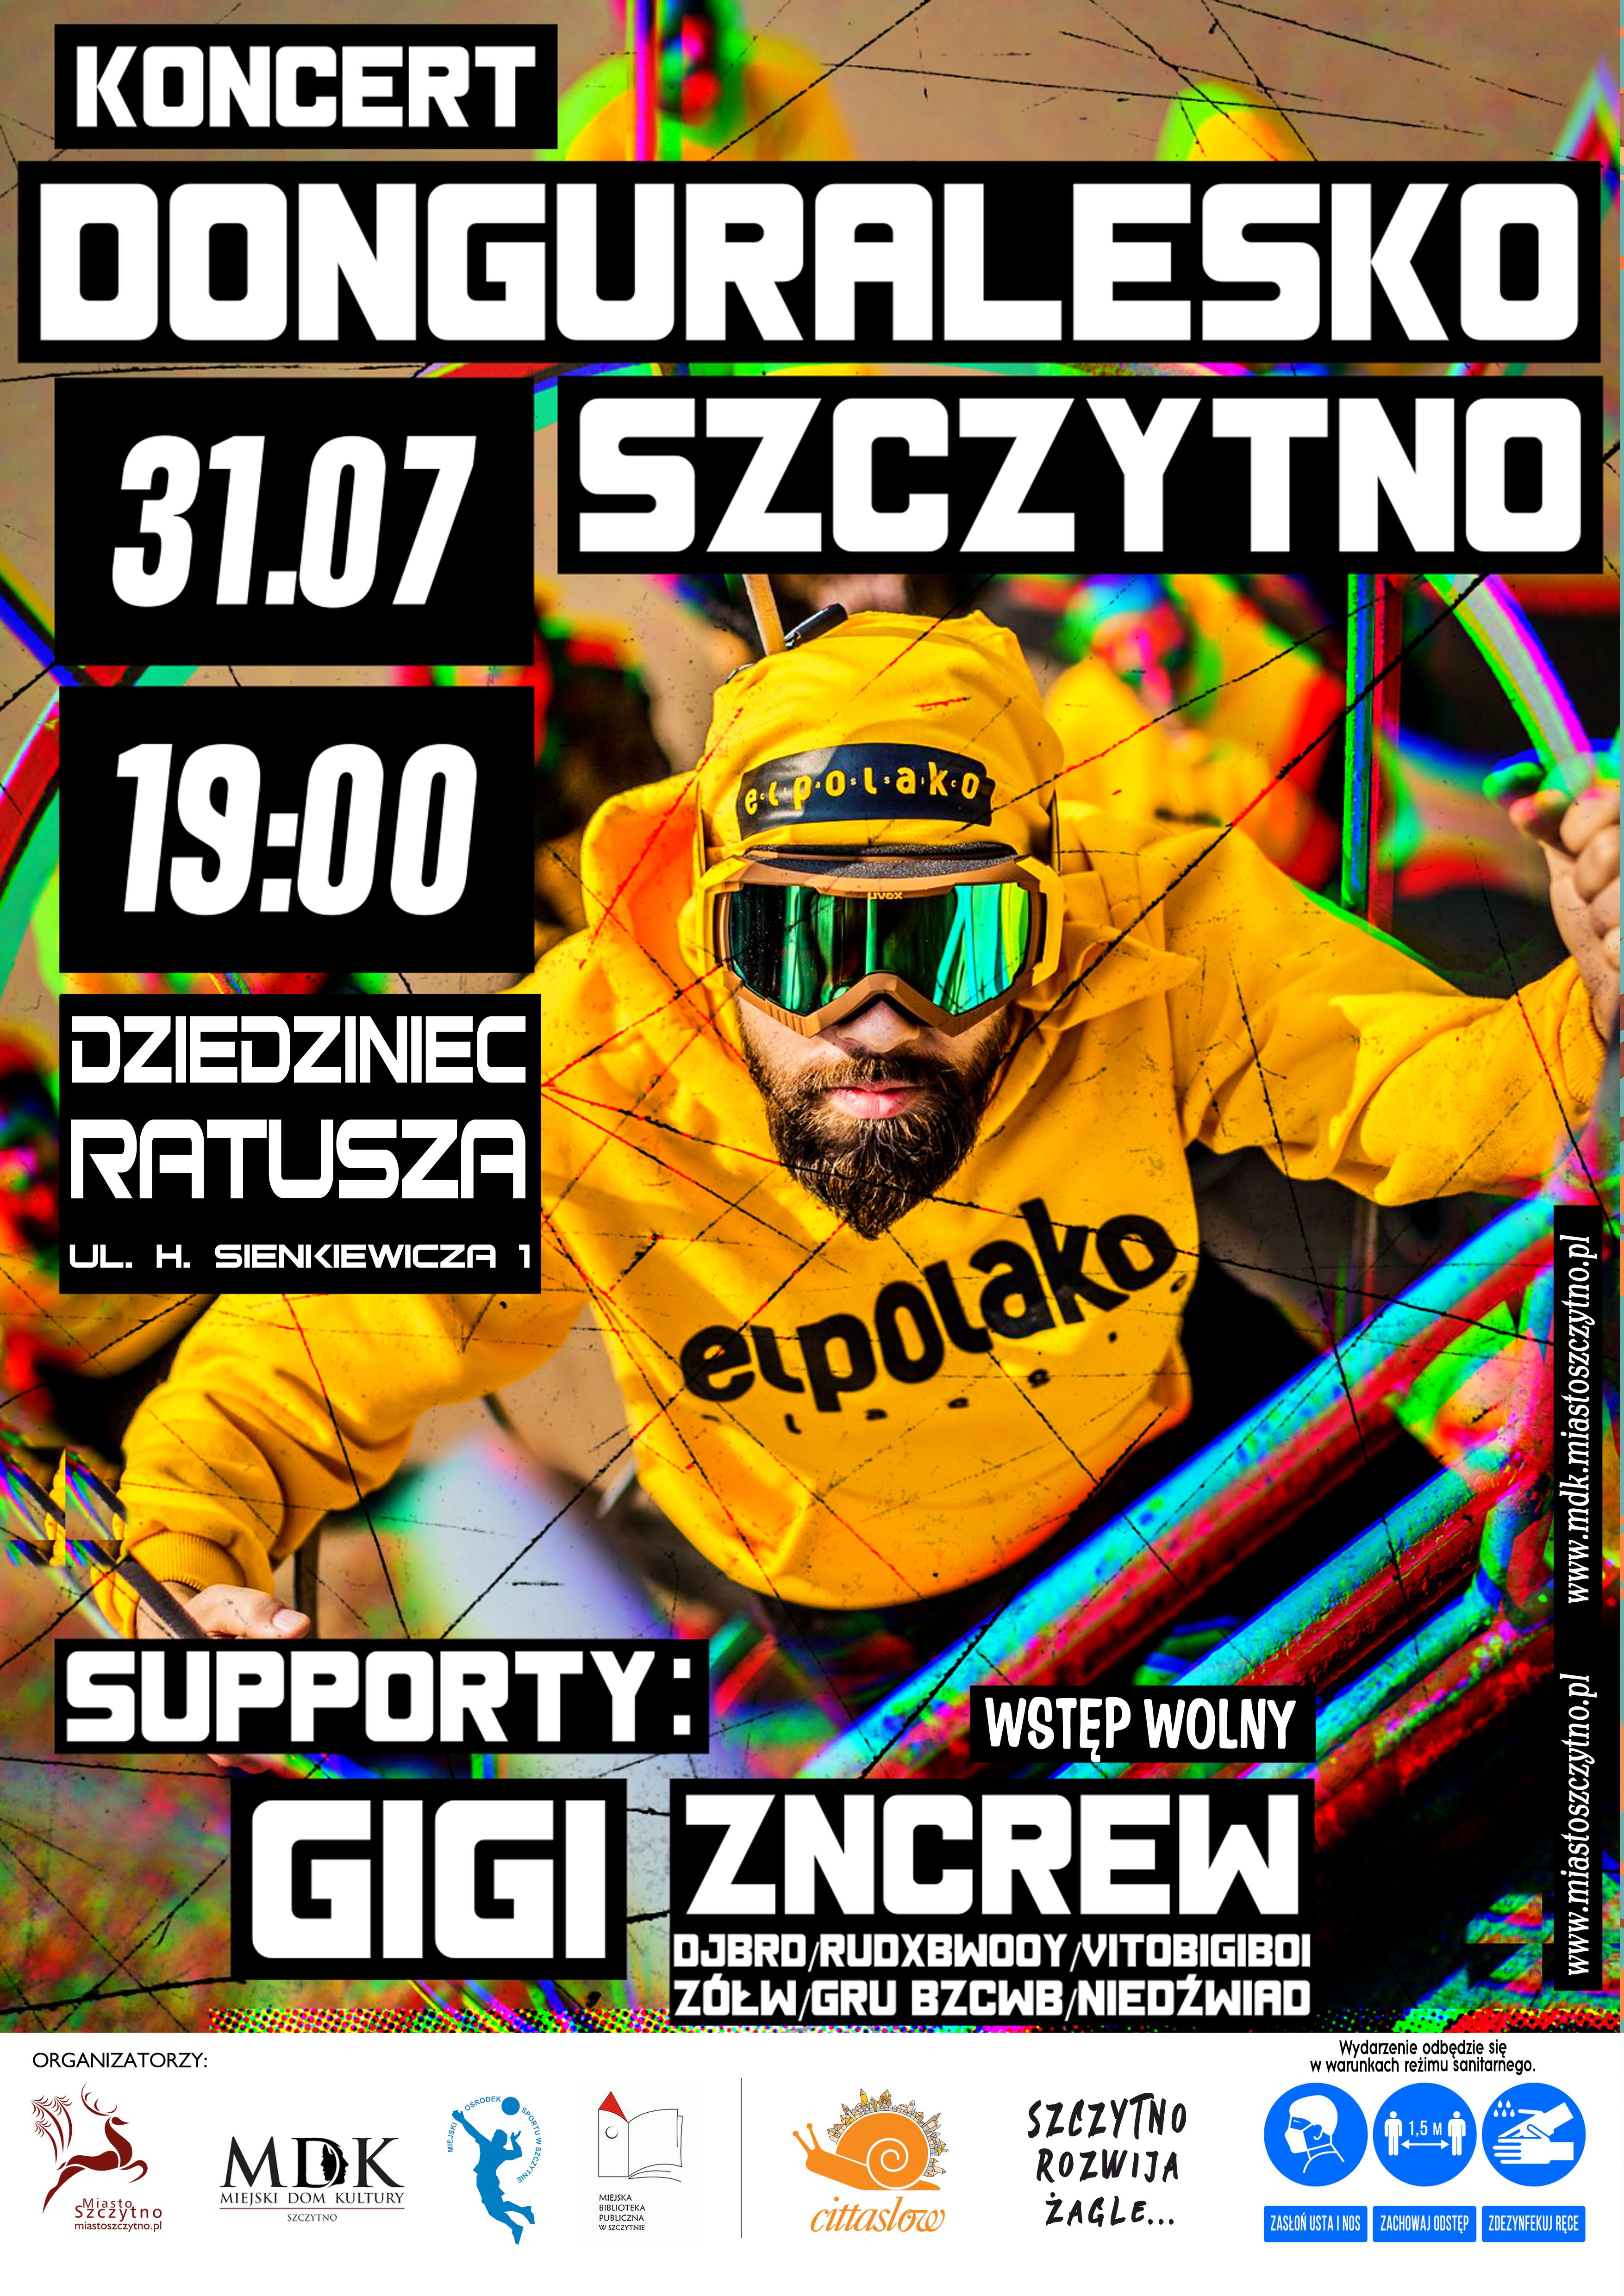 https://m.powiatszczycienski.pl/2021/07/orig/guralesko-plakat-42189.jpg